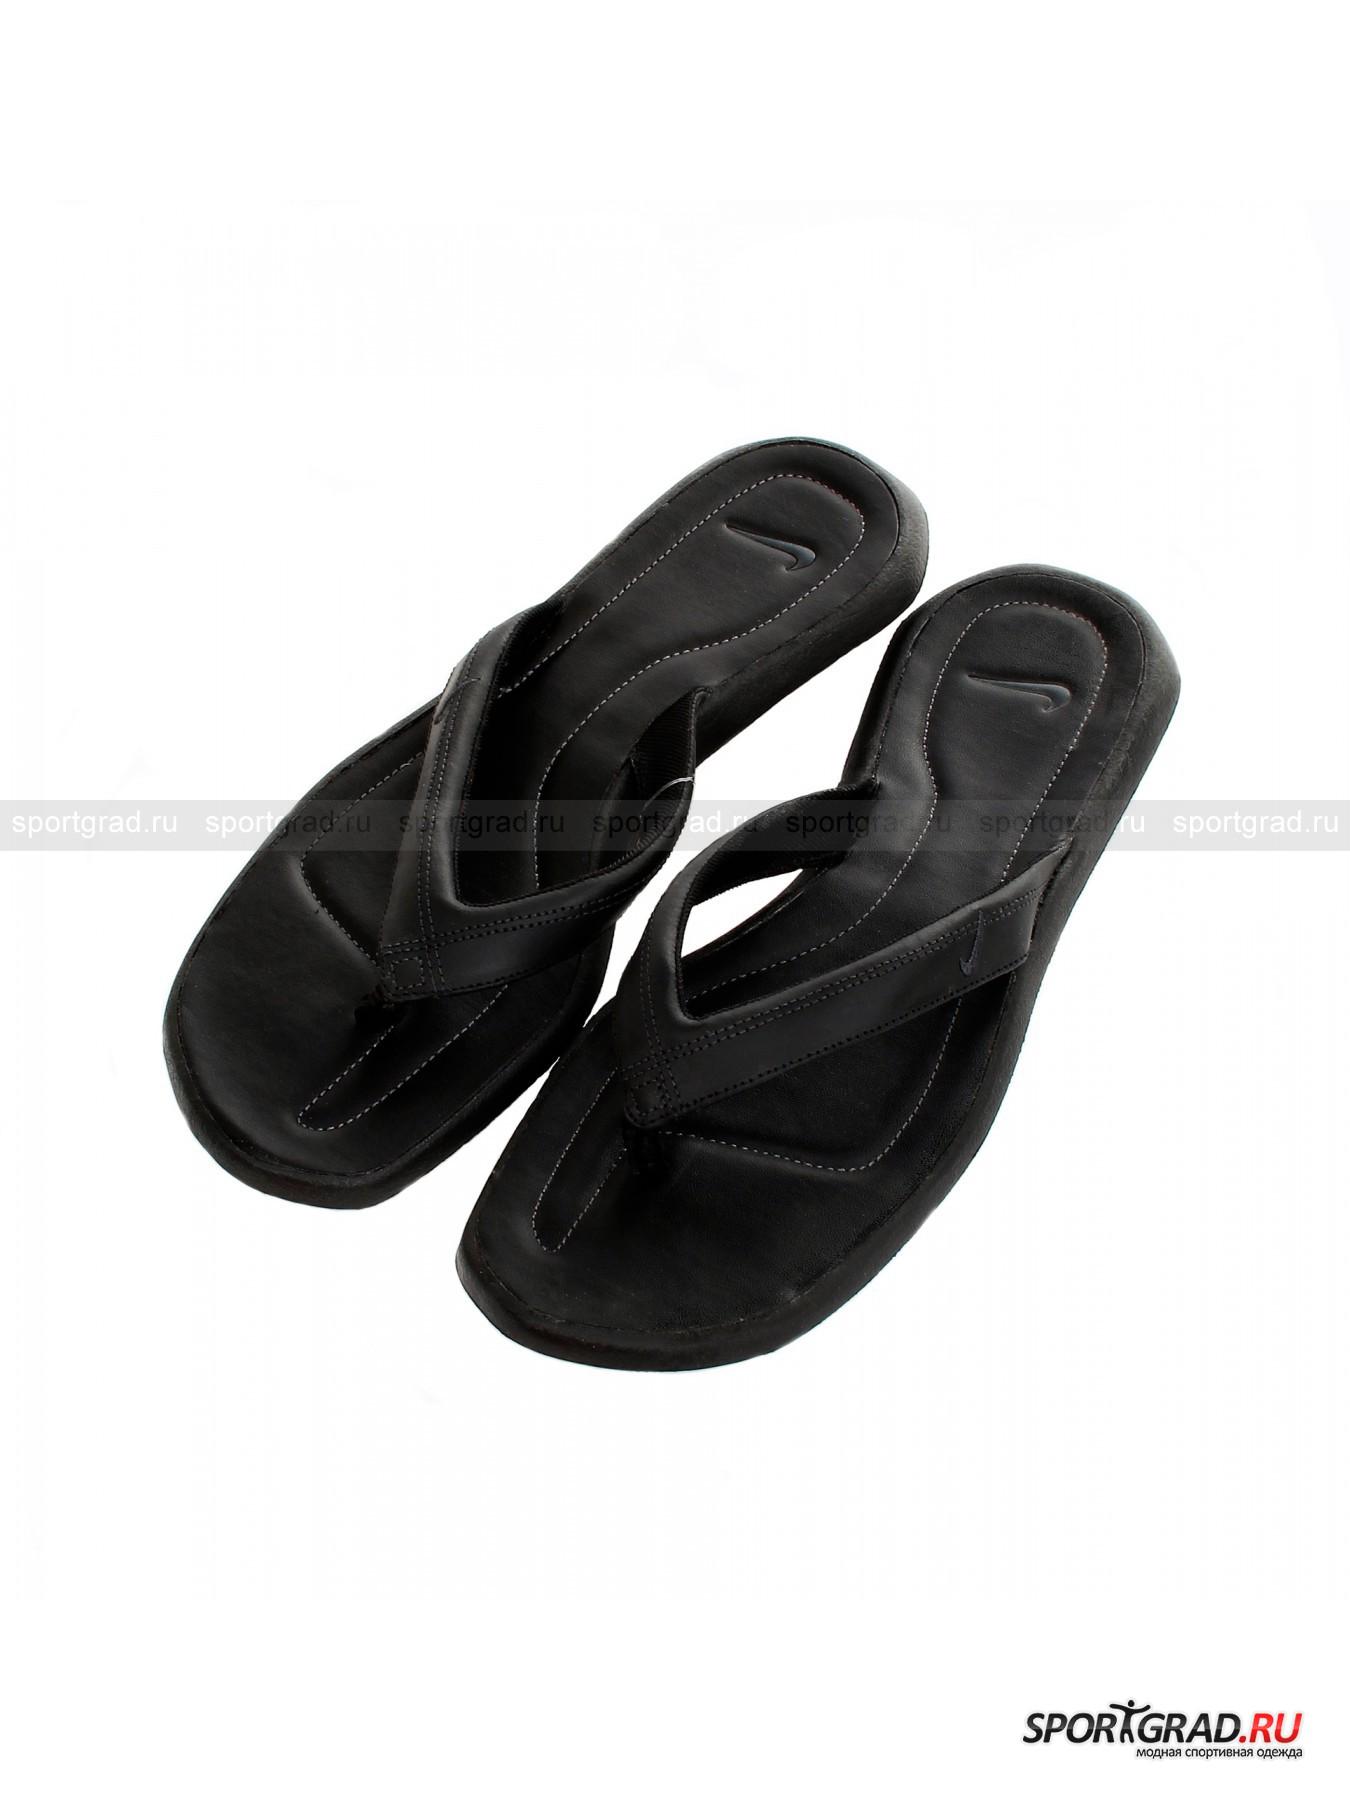 Сланцы жен. для пляжа Tiki thong leather NIKE